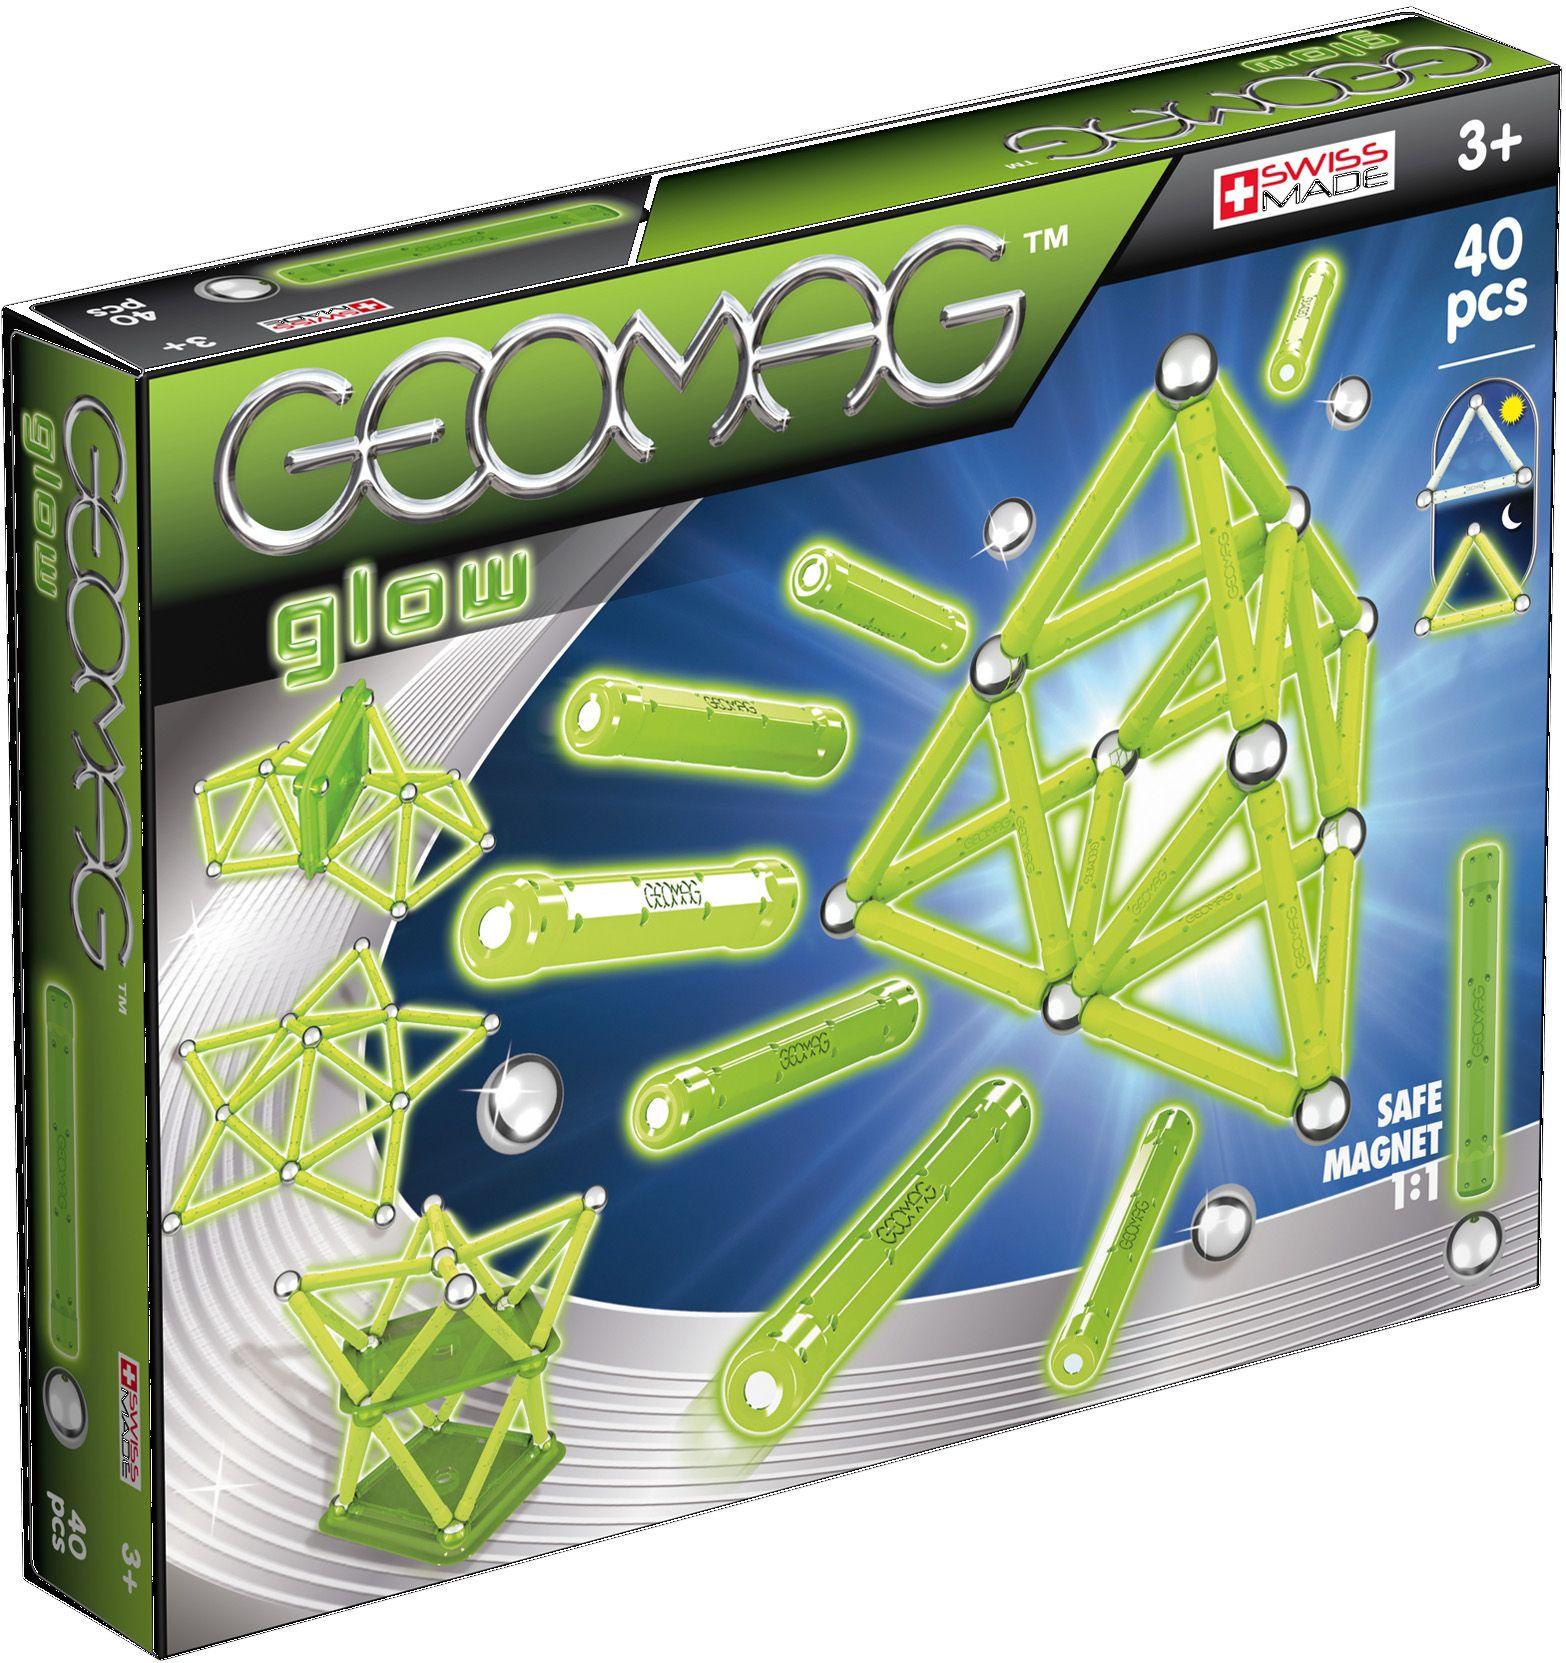 GEOMAG Geomag? Konstruktionsspielzeug (40-tlg.), »Glow«